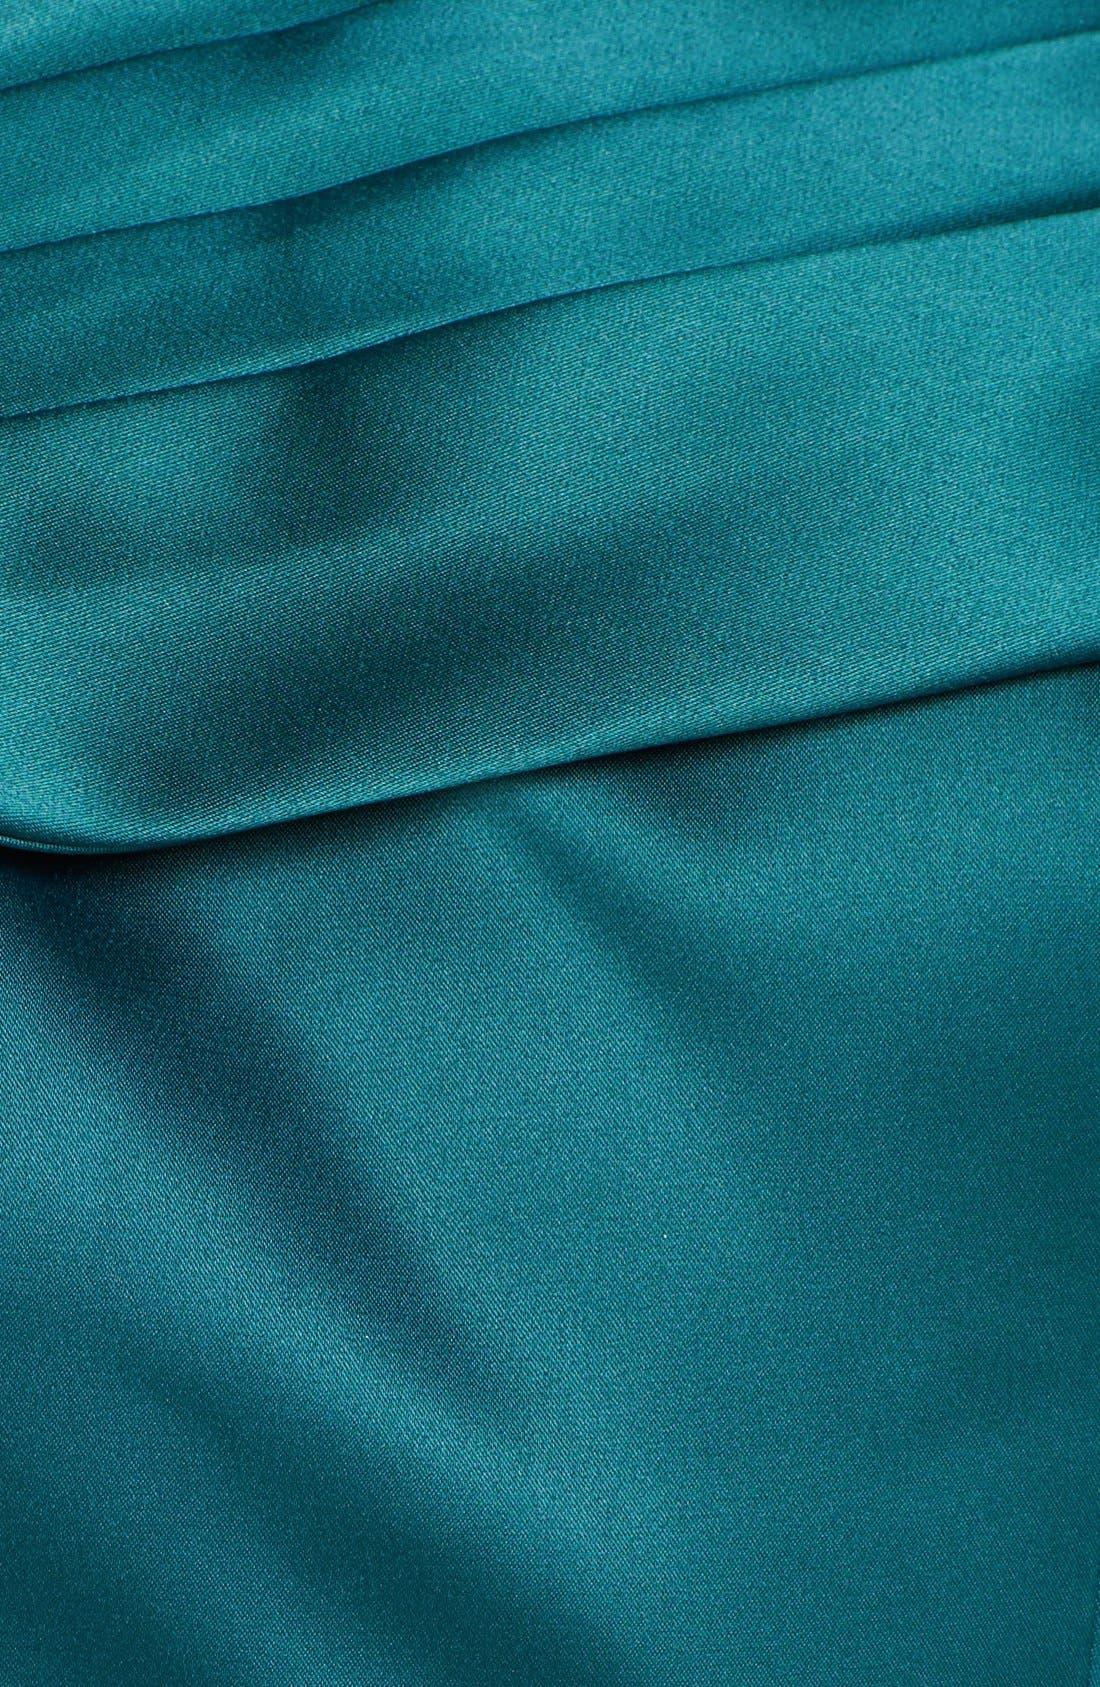 Alternate Image 3  - Adrianna Papell Portrait Collar Satin Sheath Dress